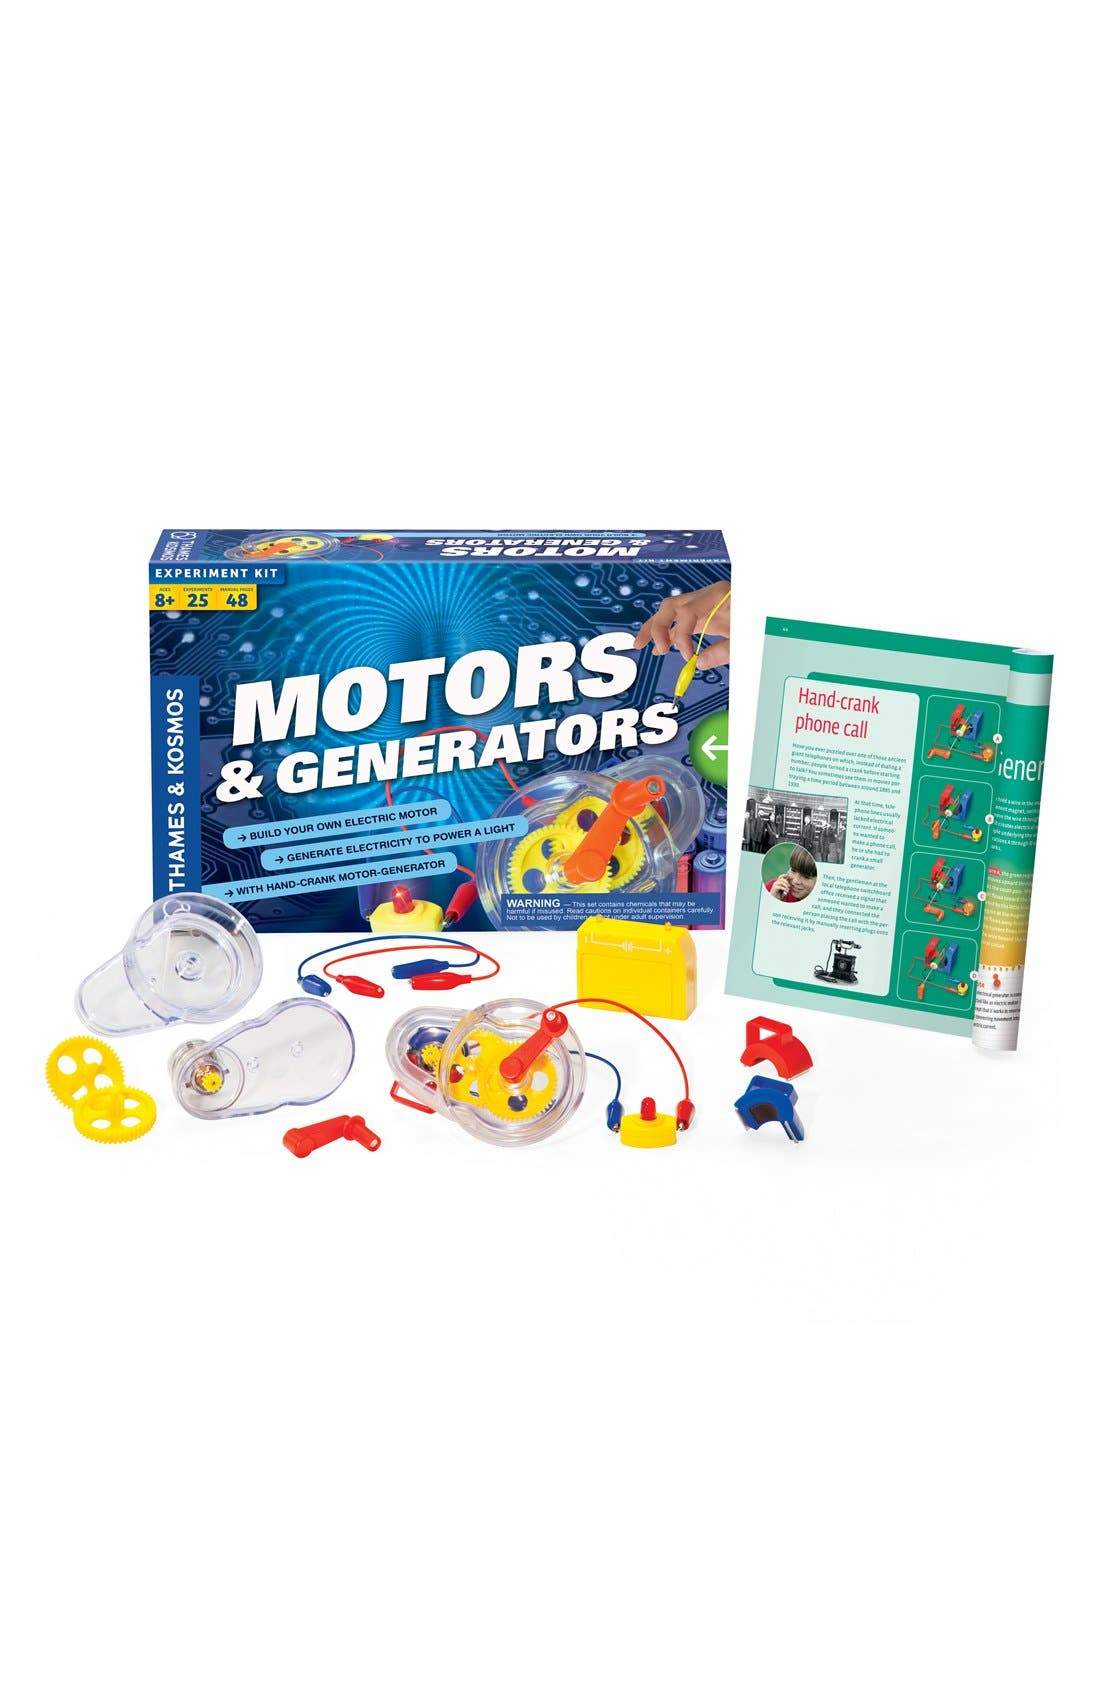 Thames & Kosmos 'Motors & Generators' Experiment Kit